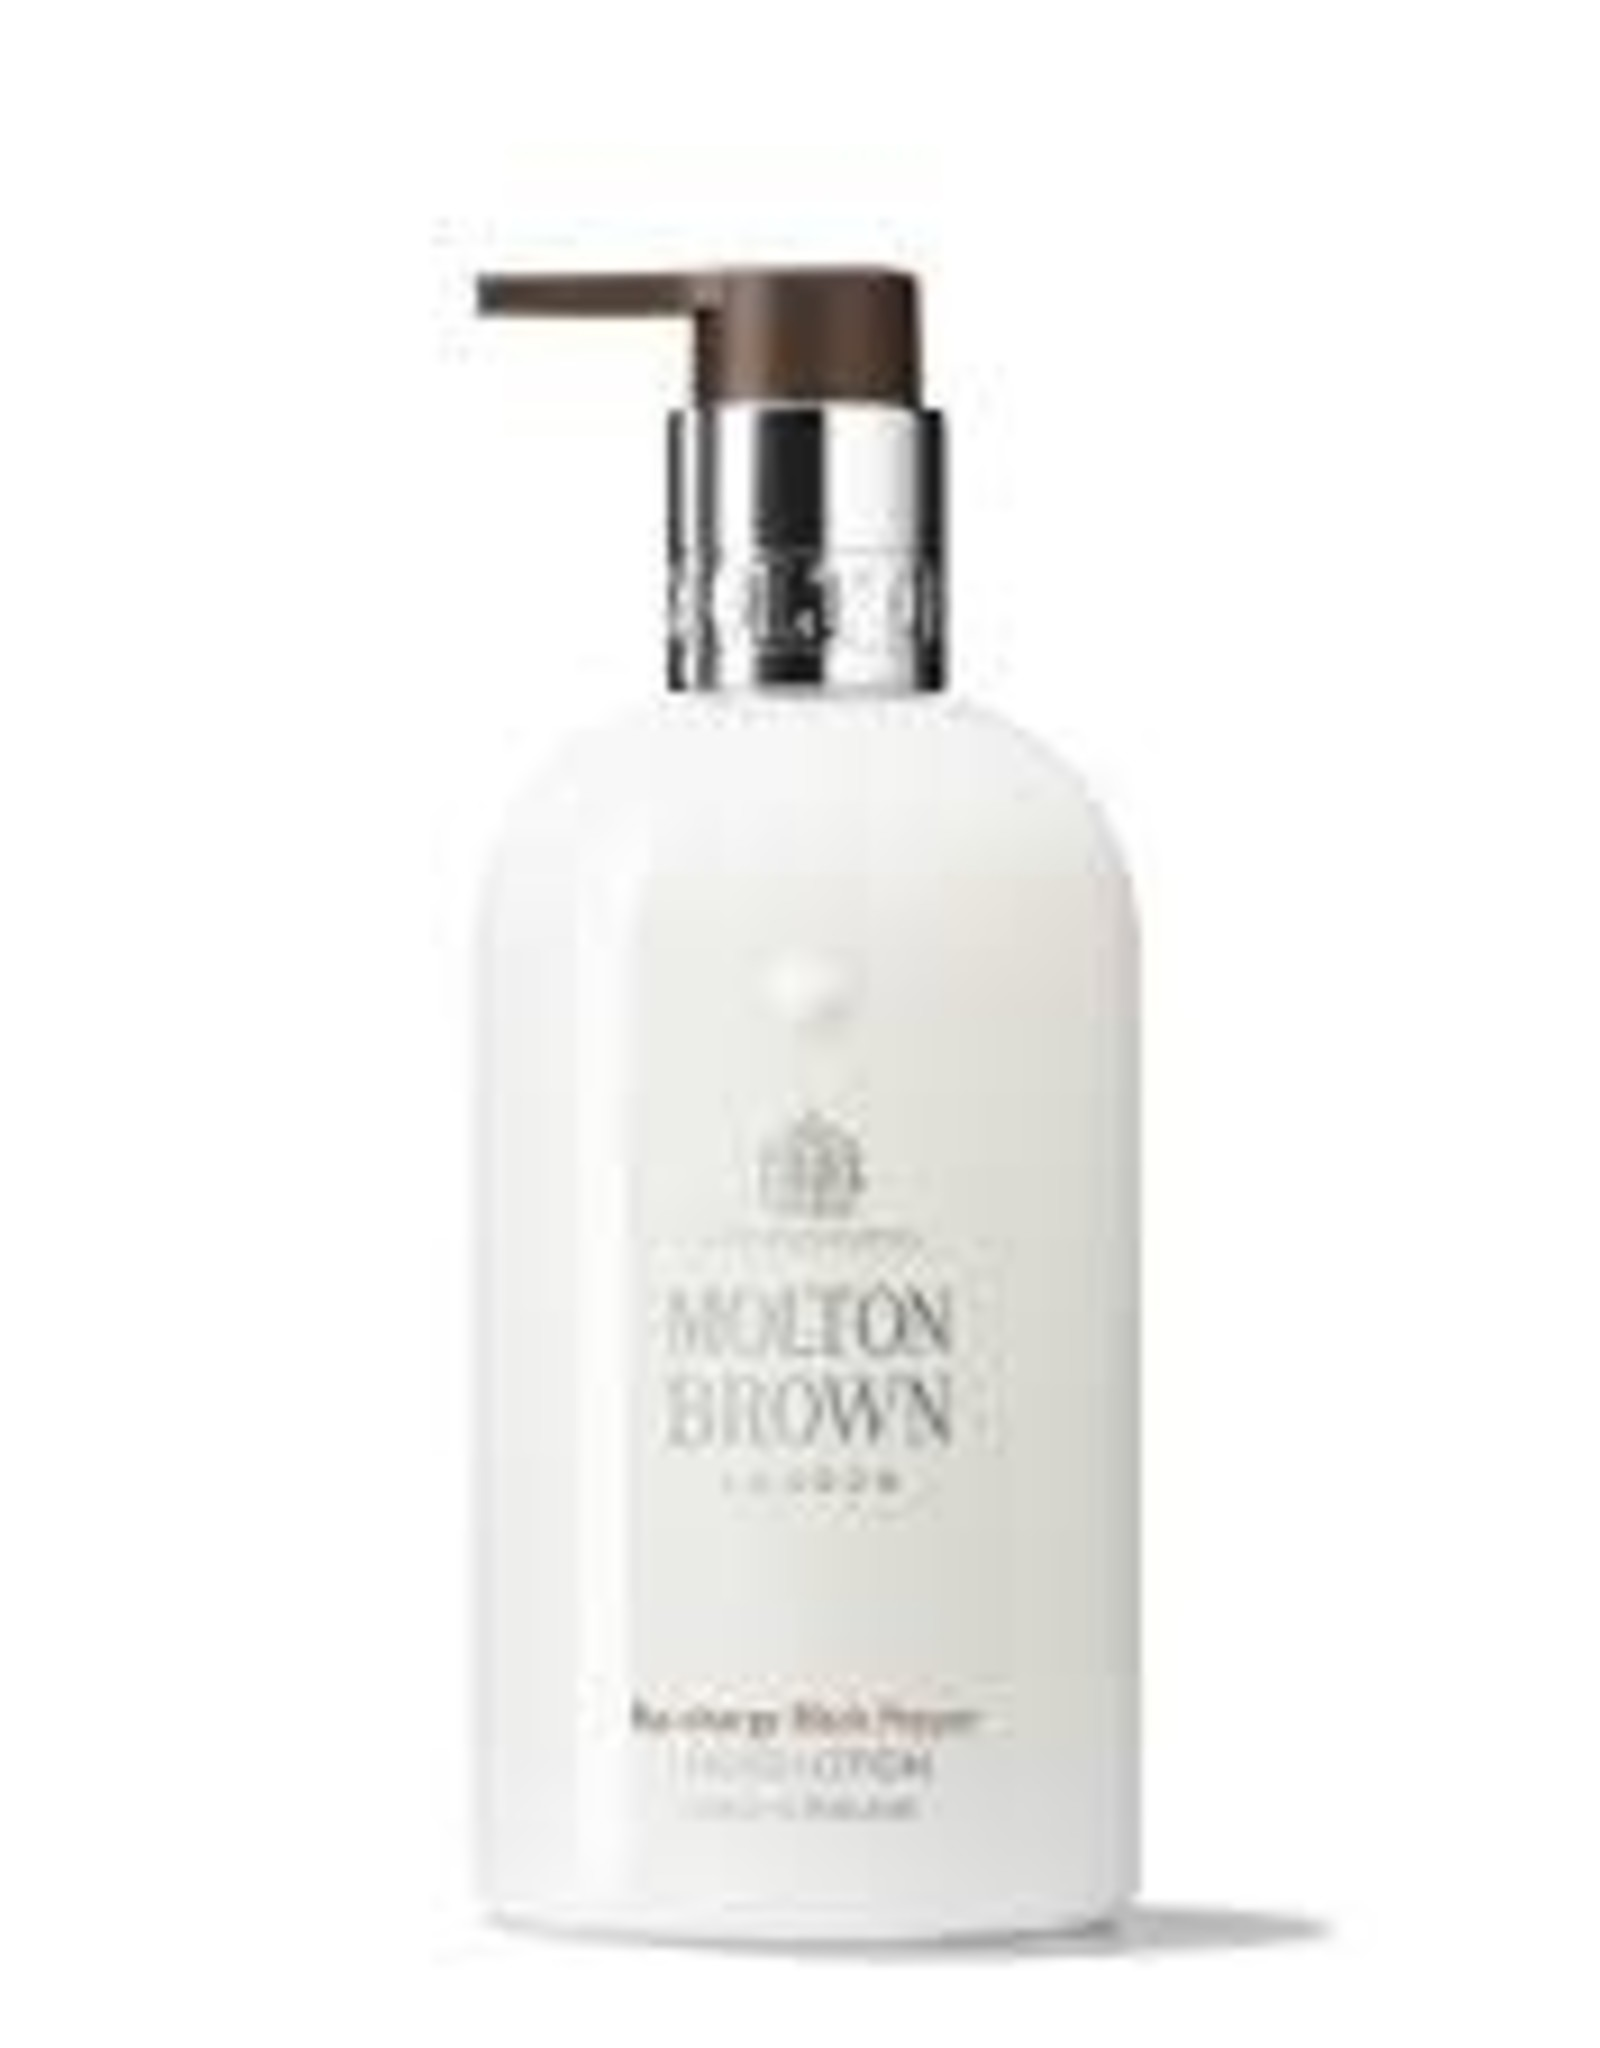 Molton Brown Black Peppercorn Hand Lotion